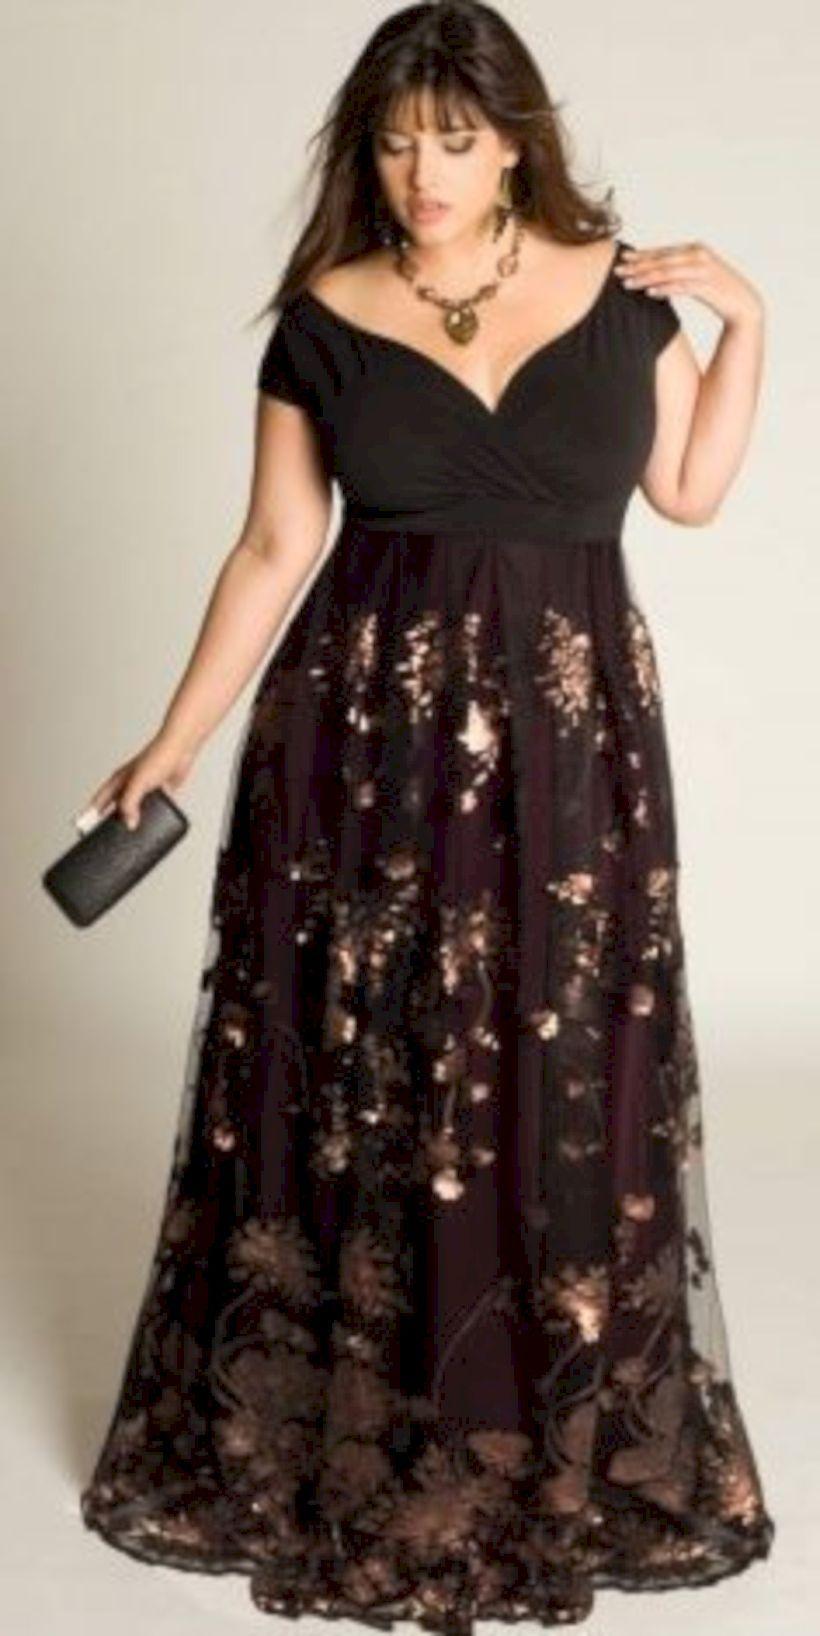 adorable plus size fashion for women fashion style pinterest